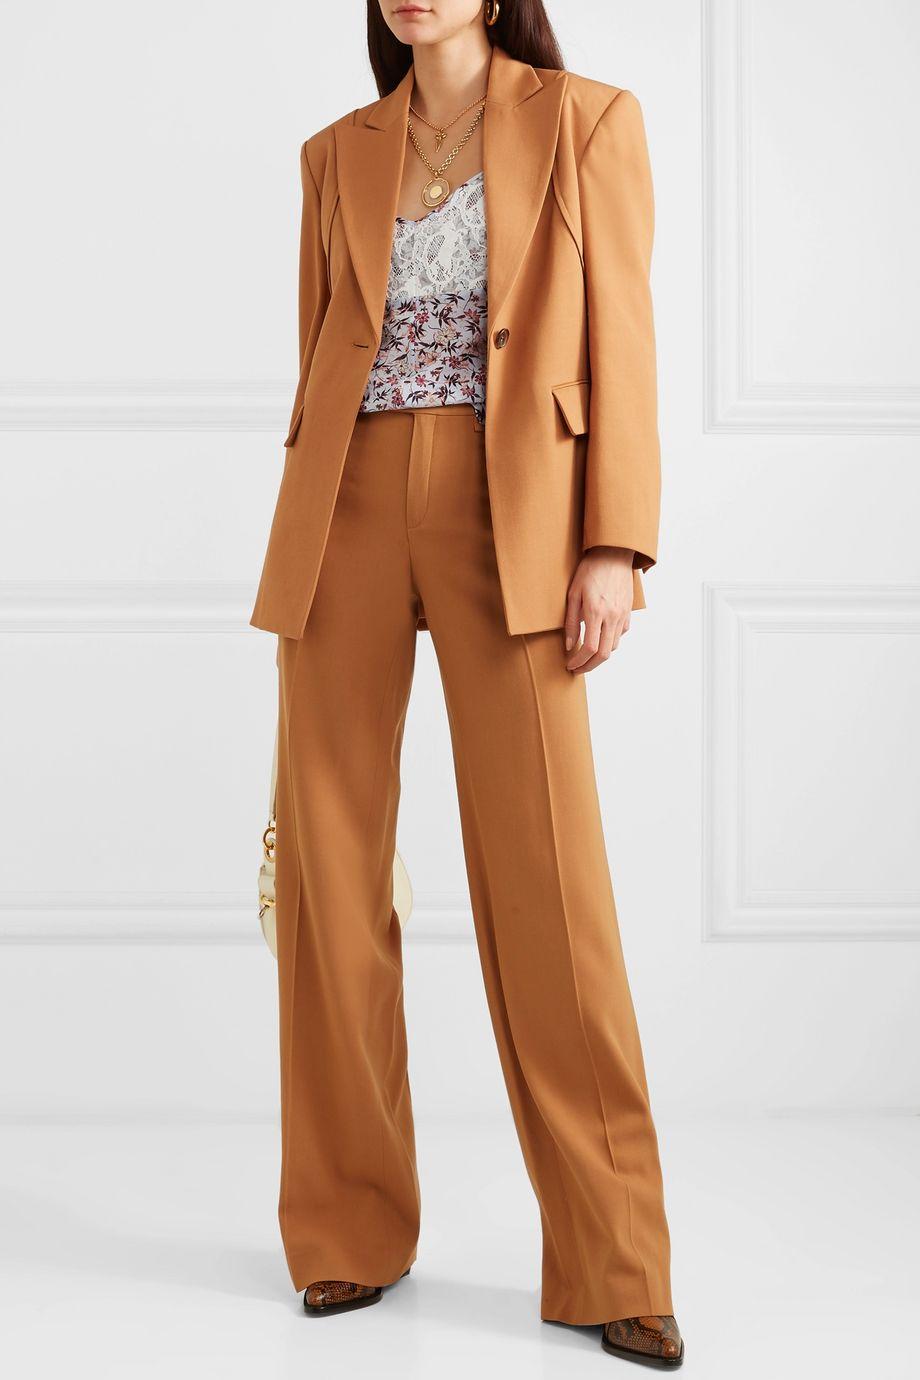 Chloé Lace-paneled floral-print georgette camisole